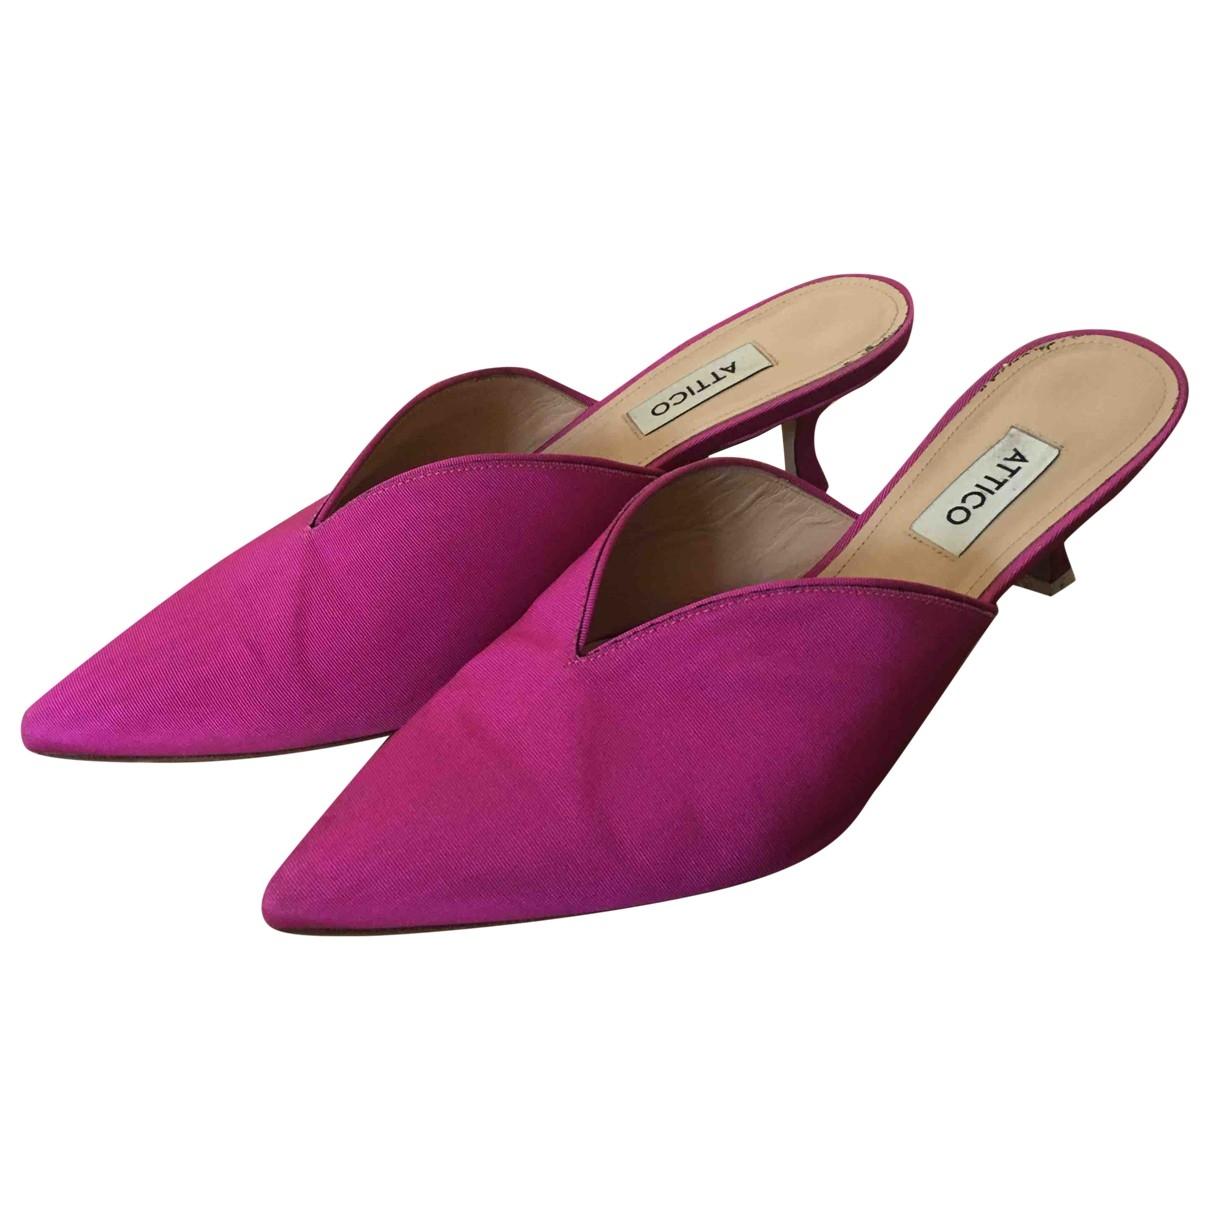 Attico \N Pink Cloth Mules & Clogs for Women 39.5 EU